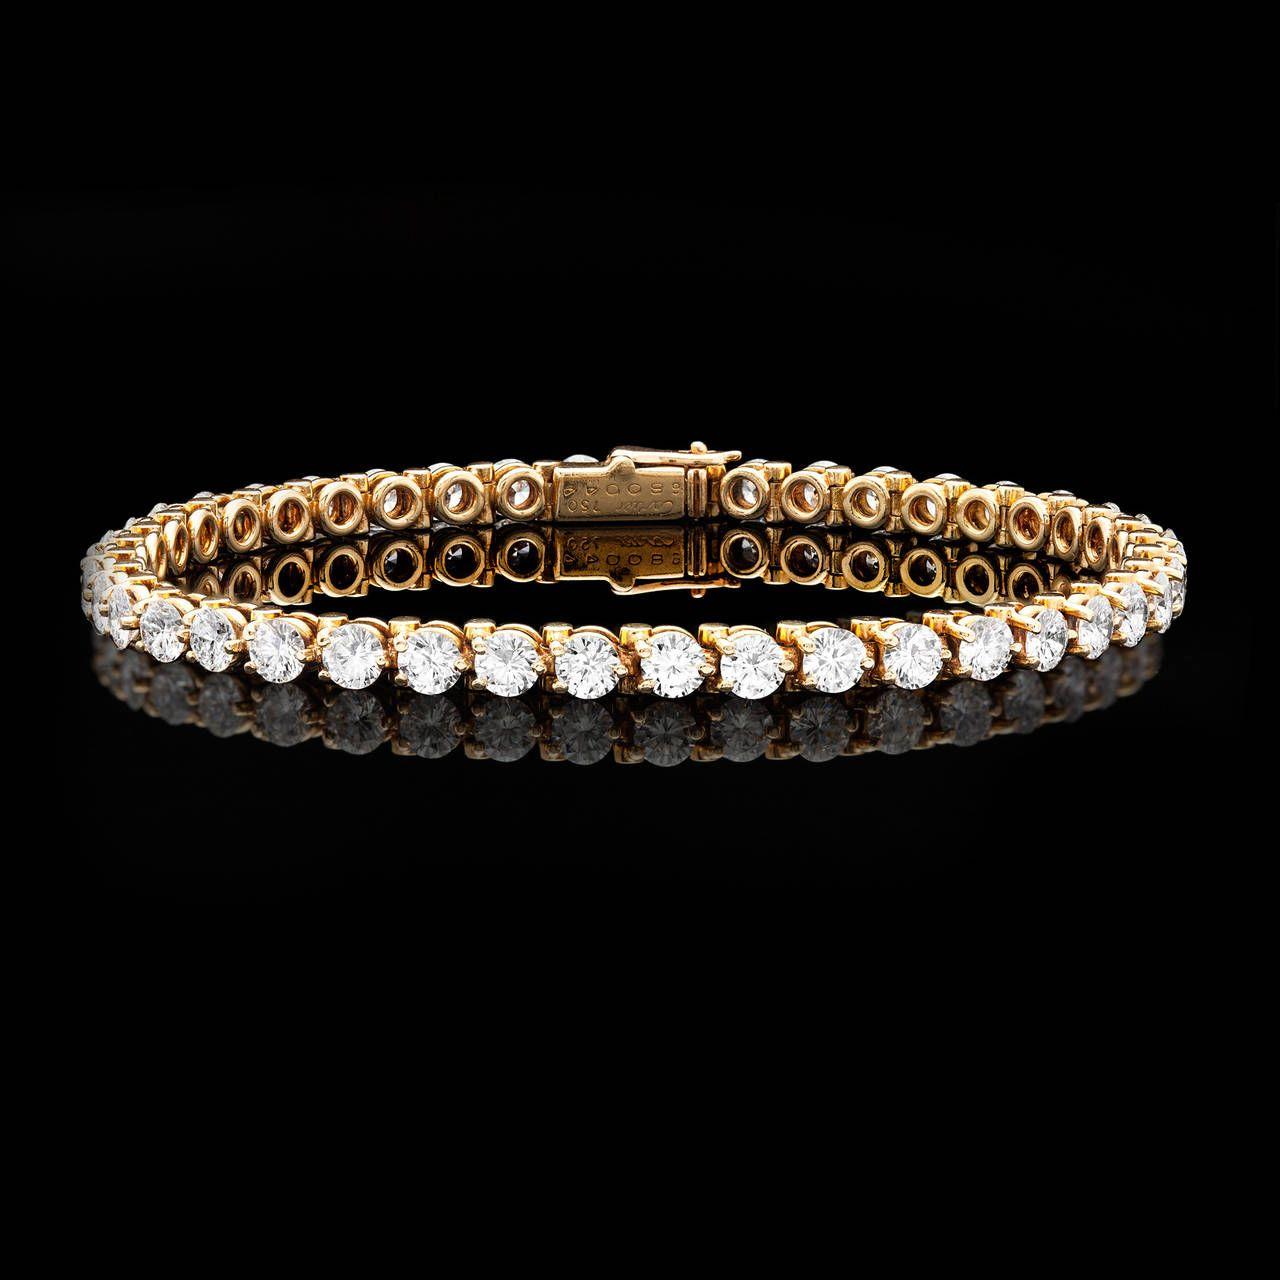 Cartier 6 30 Carat Diamond Gold Tennis Bracelet Tennis Bracelet Diamond Jewelry Bracelets Gold Diamond Bracelets